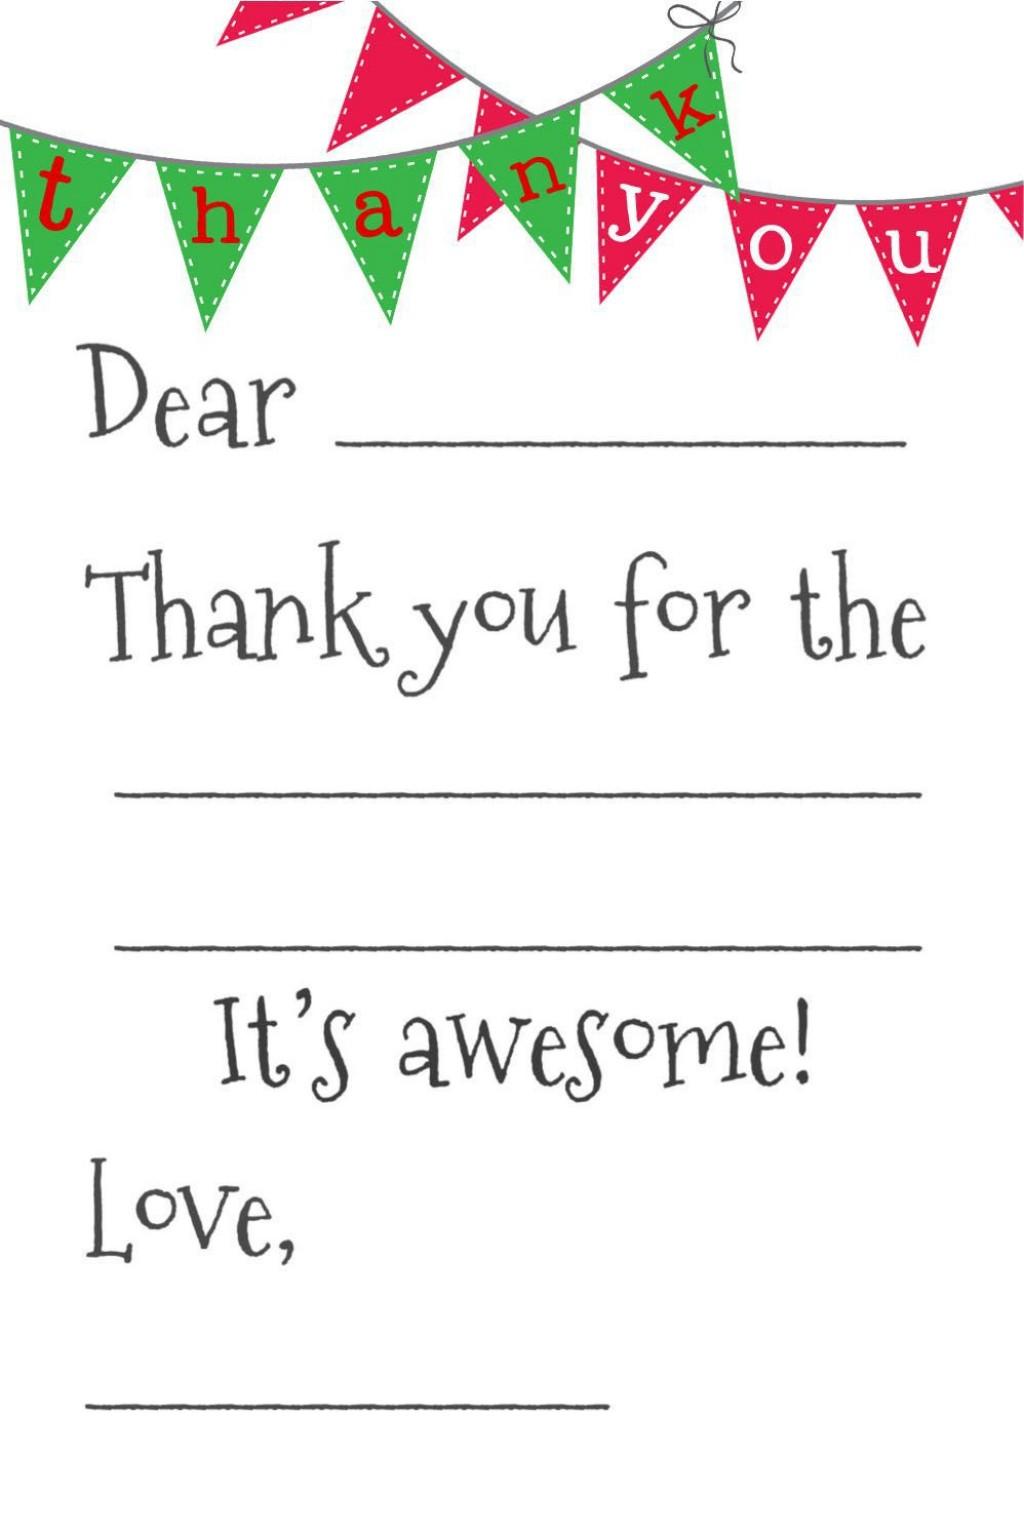 003 Amazing Thank You Note Template Free Sample  Poshmark Christma TeacherLarge